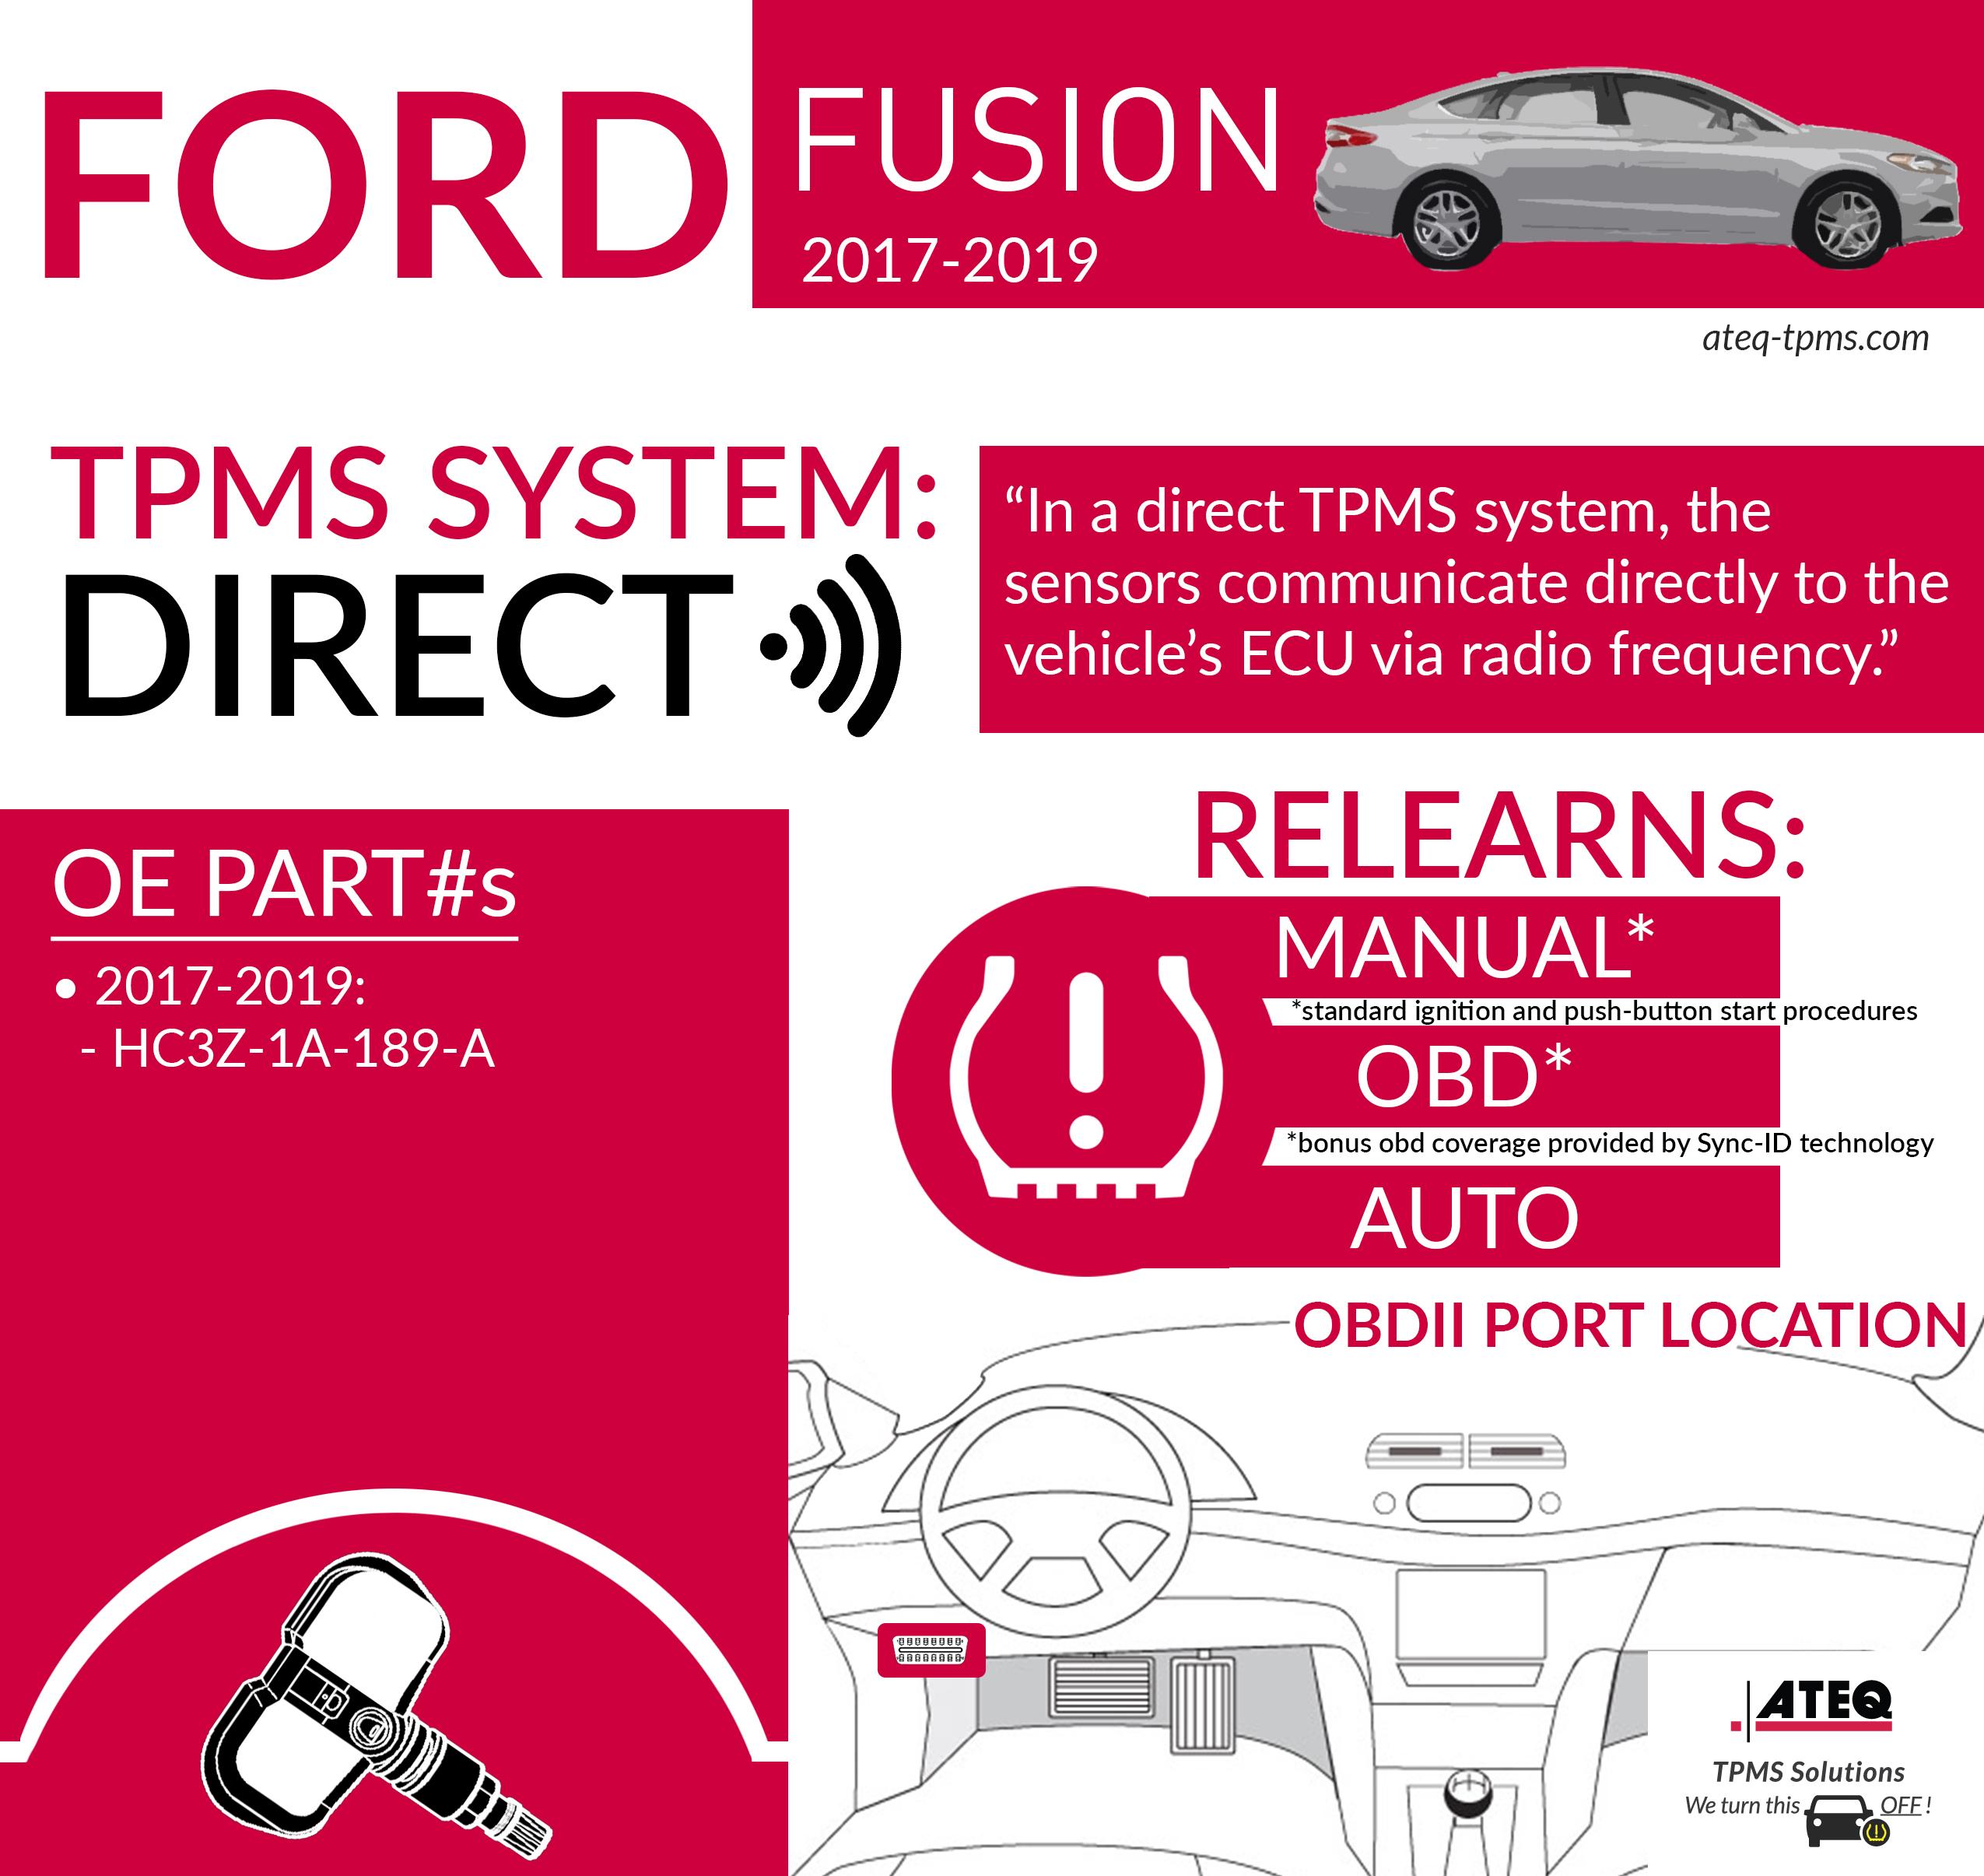 [CSDW_4250]   TPMS diagnostic information – Ford Fusion 2016 - 2018 - ATEQ-TPMS | 2016 Ford Fusion Hybrid Fuse Box Location |  | ATEQ TPMS tools